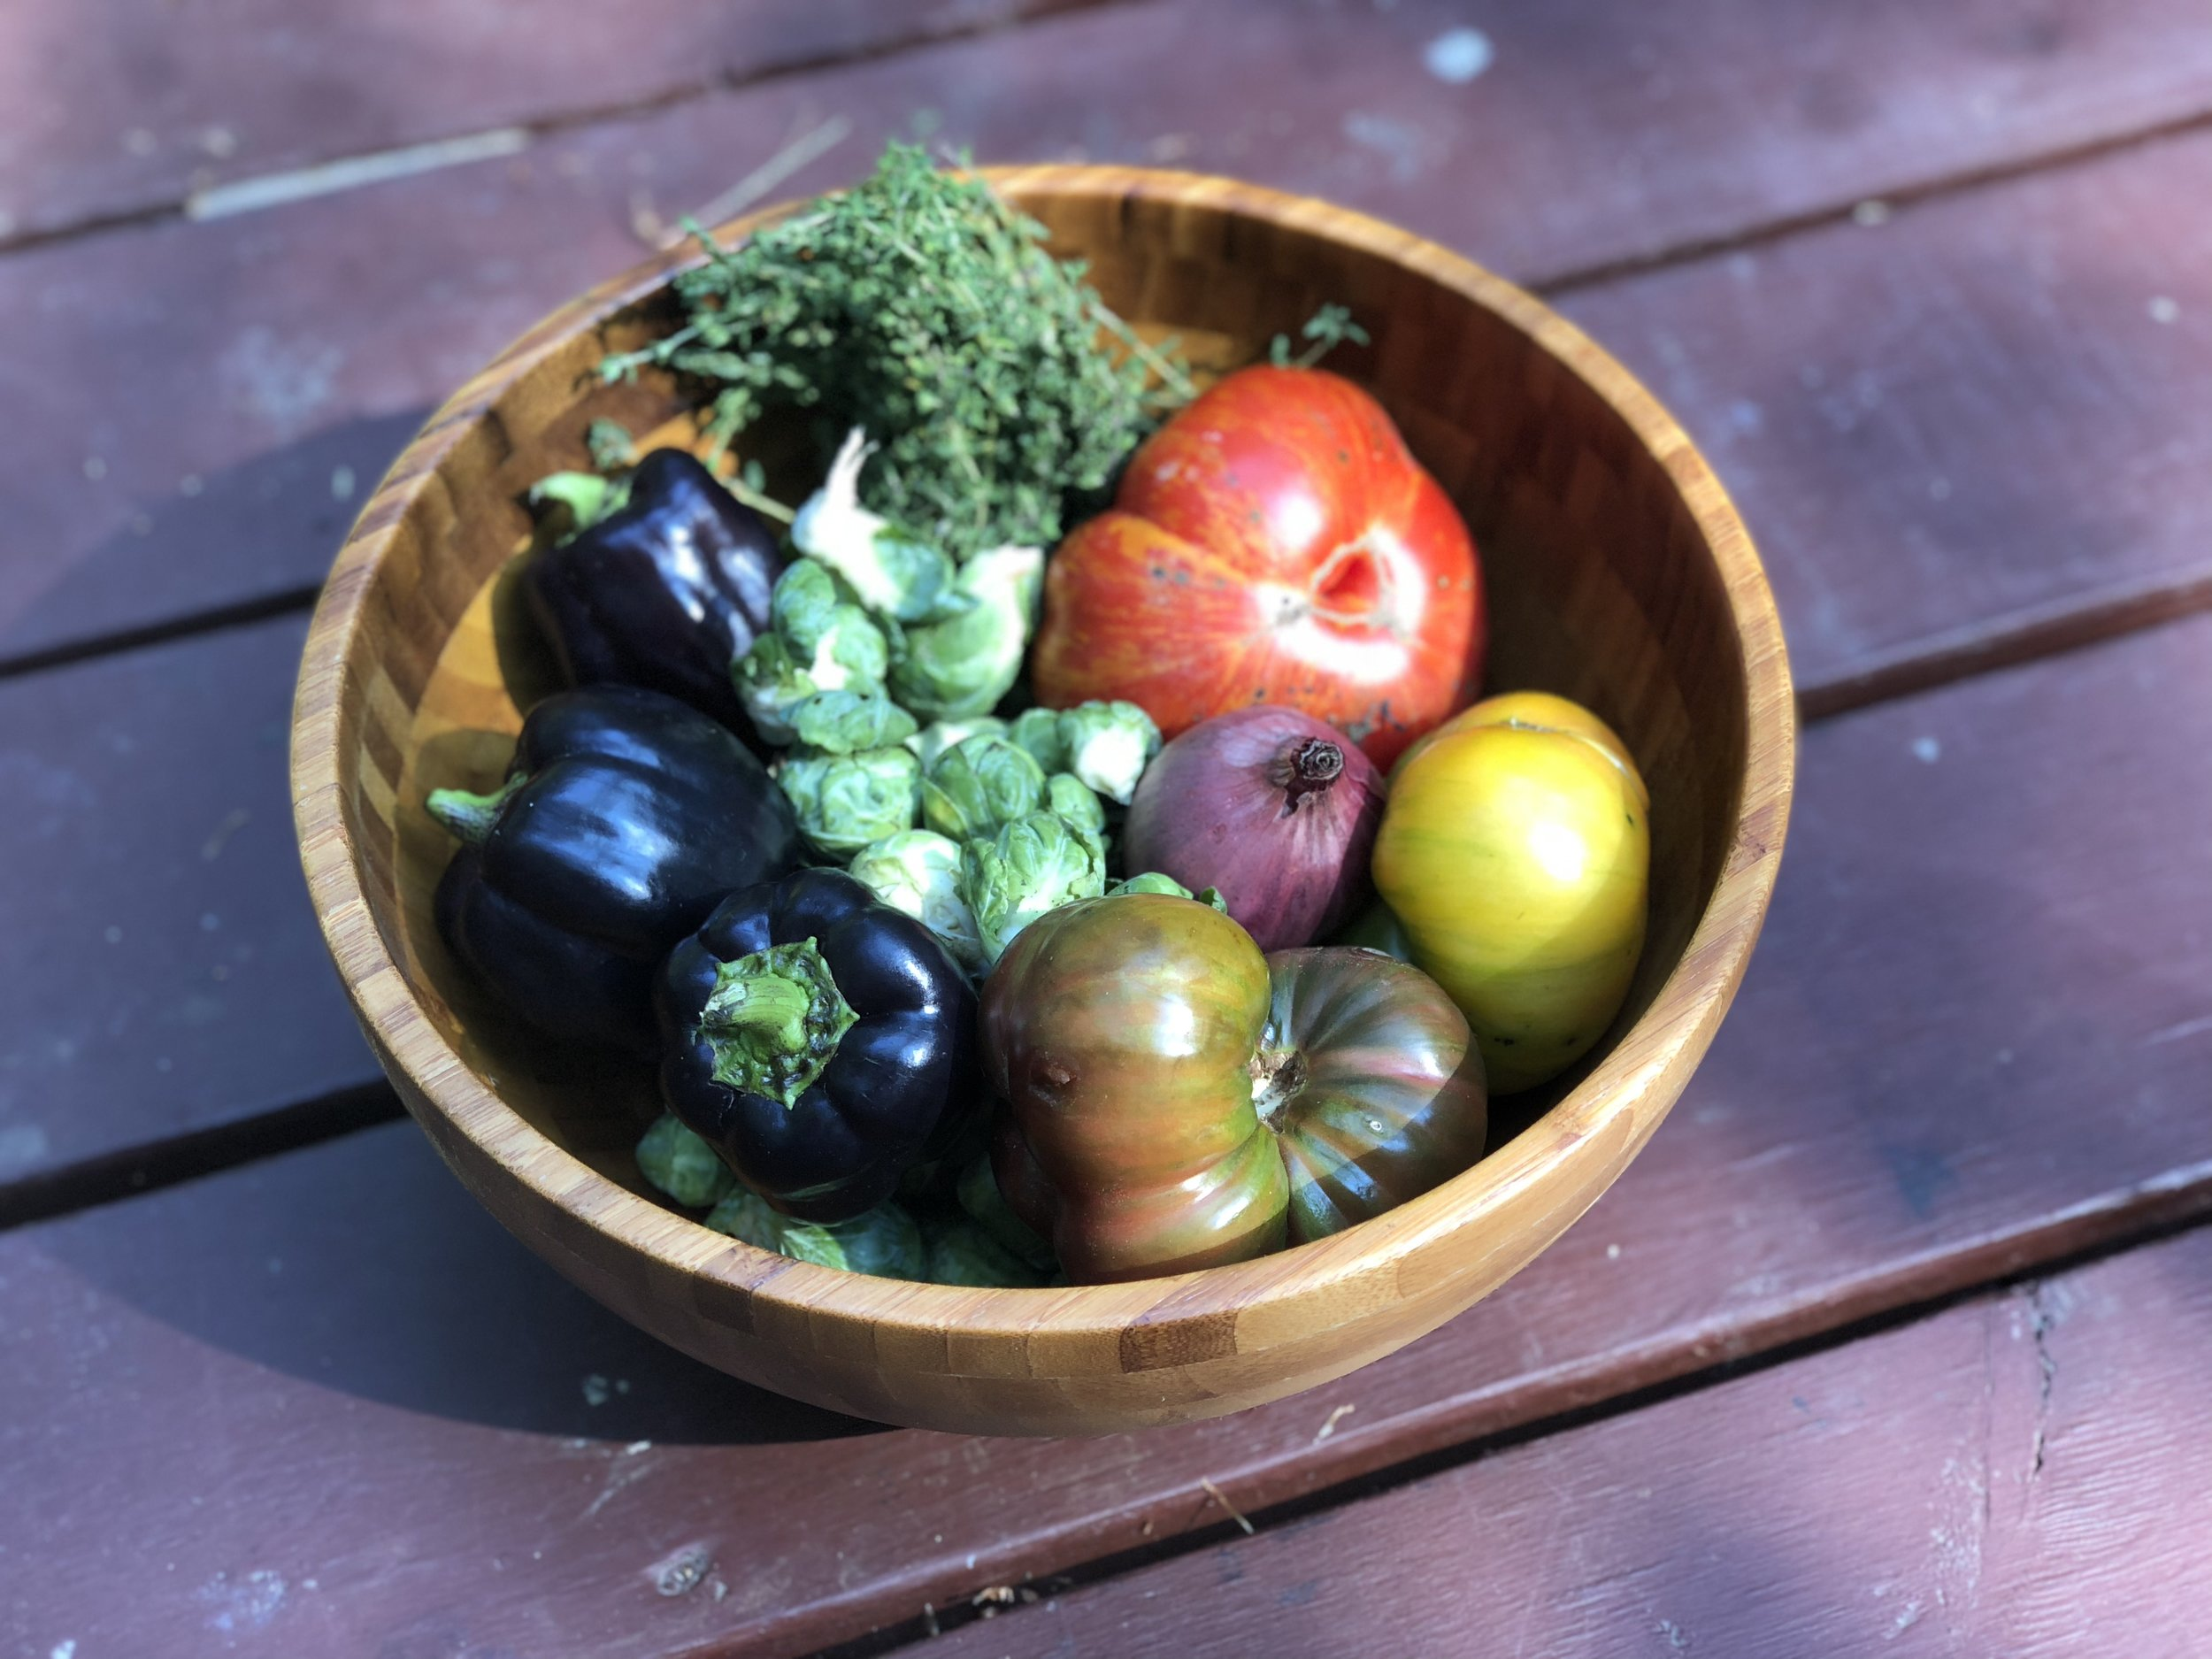 Vegetables from SOWA farmer's Market